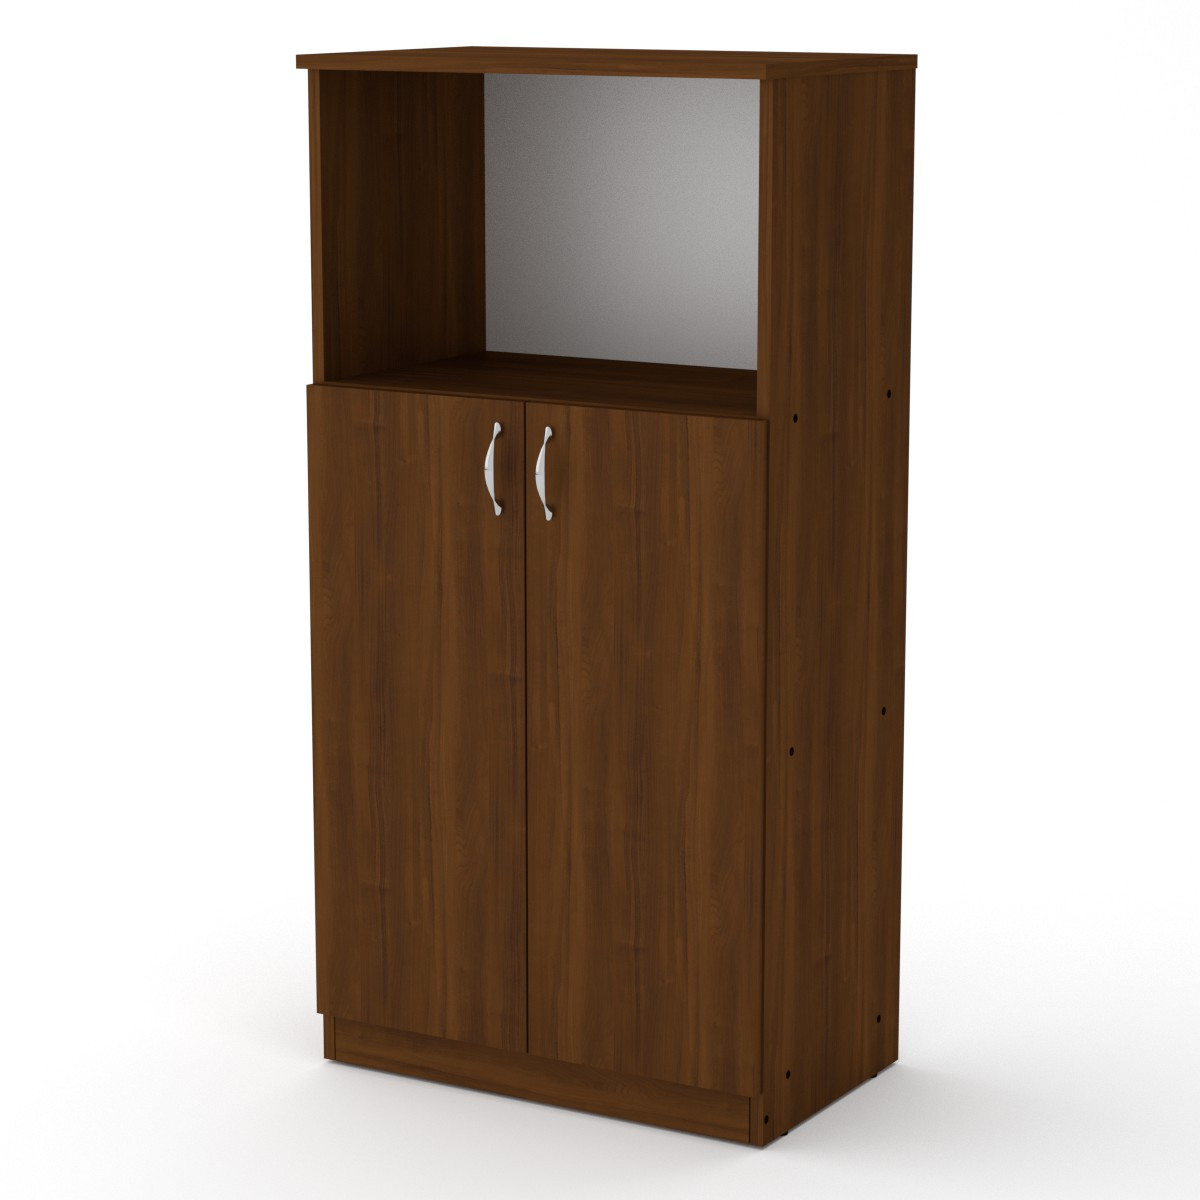 Шкаф книжный КШ-15 орех экко Компанит (61х37х120 см)